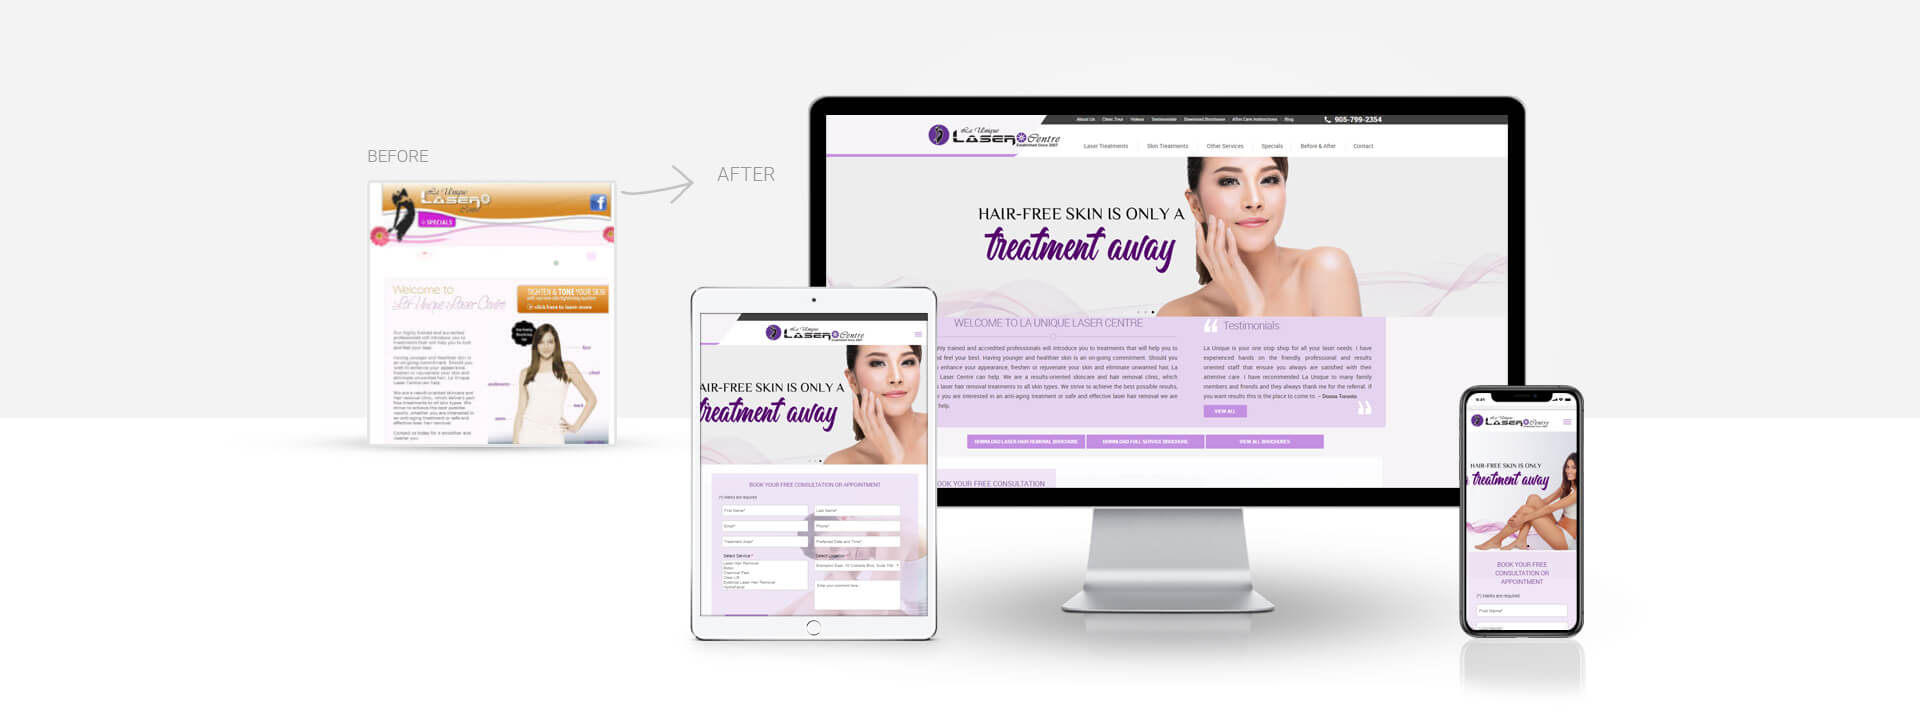 Wordpress beauty and laser center website